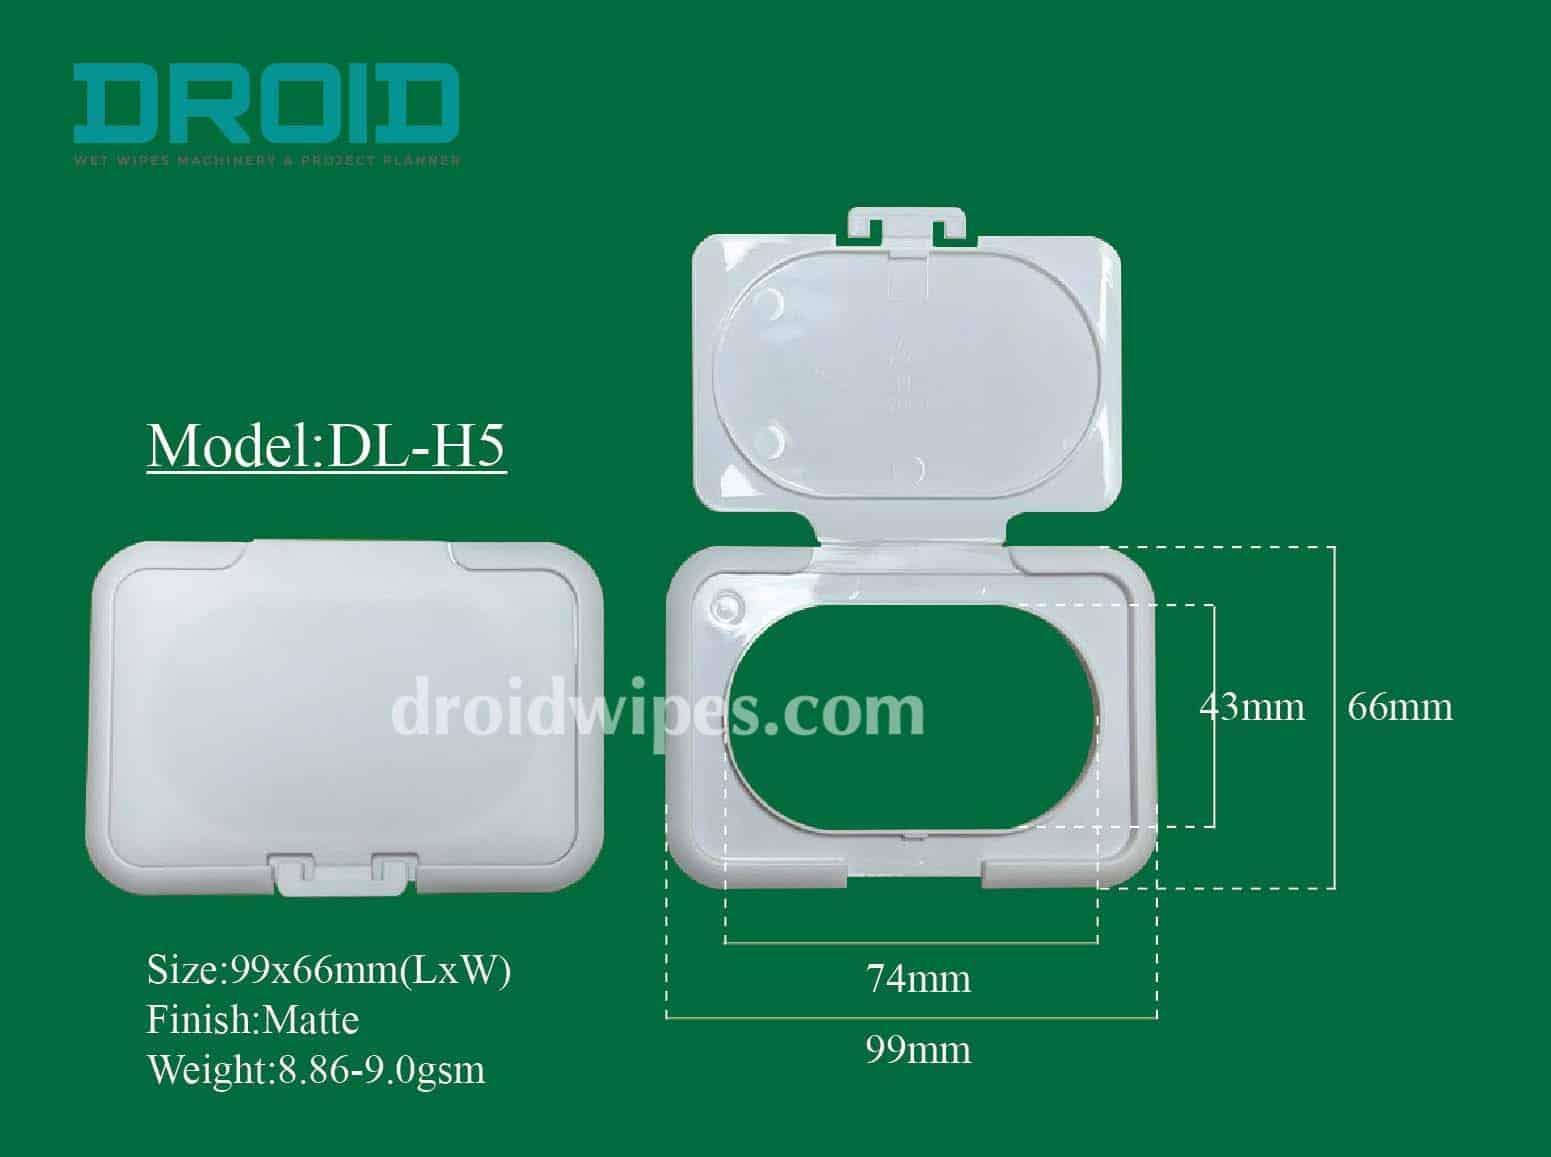 Plastic lid for wet wipes 4 - Plastic Lid for Wet Wipes